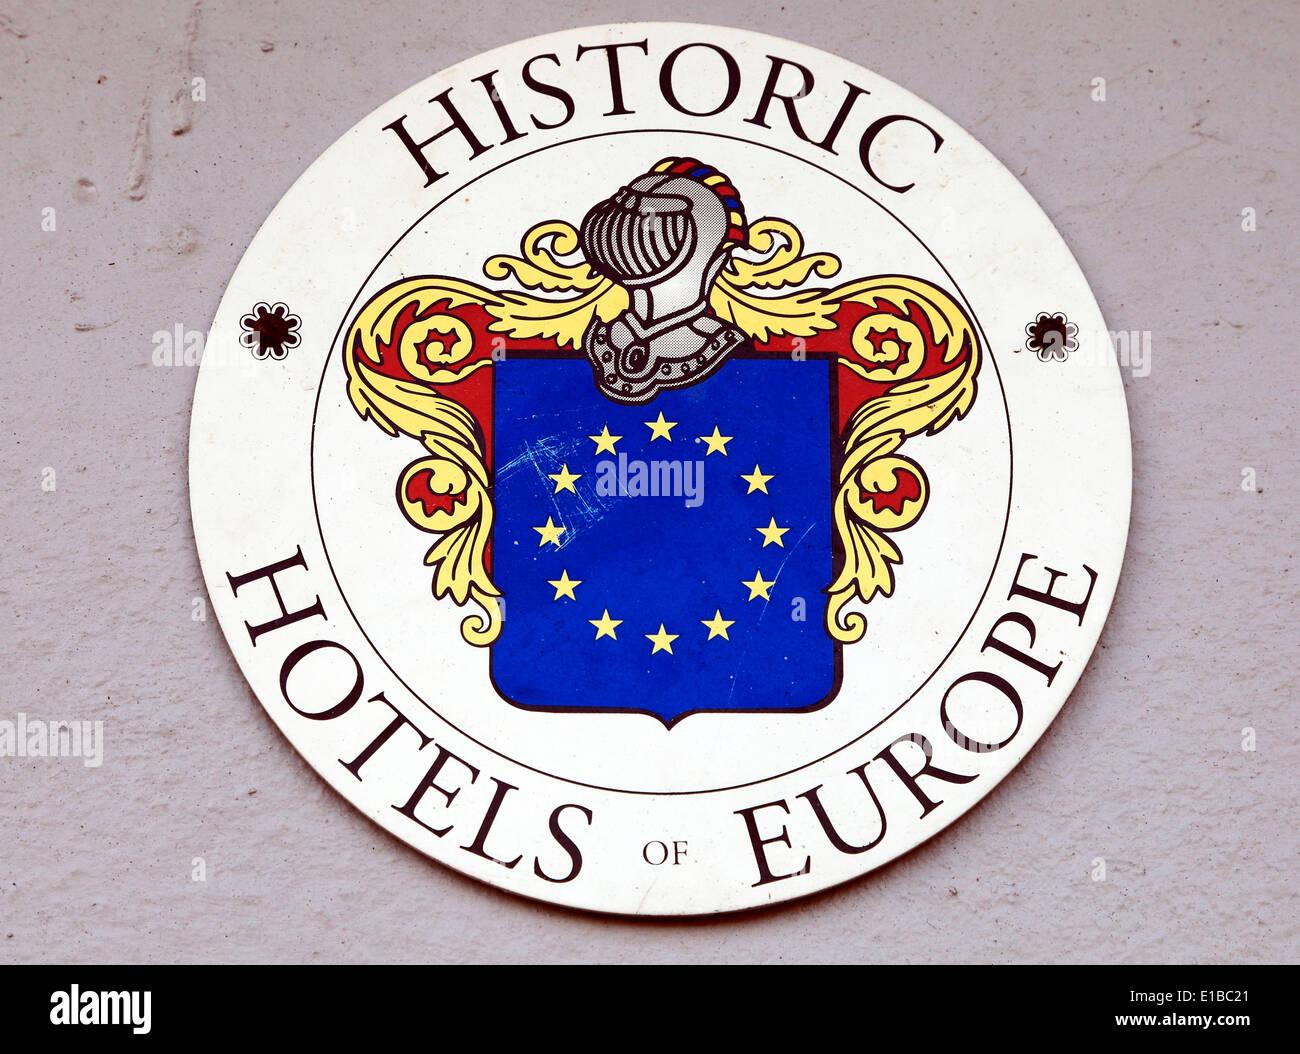 Historic Hotels of Europe Plaque, The Hoste Hotel, Burnham Market Norfolk England UK - Stock Image